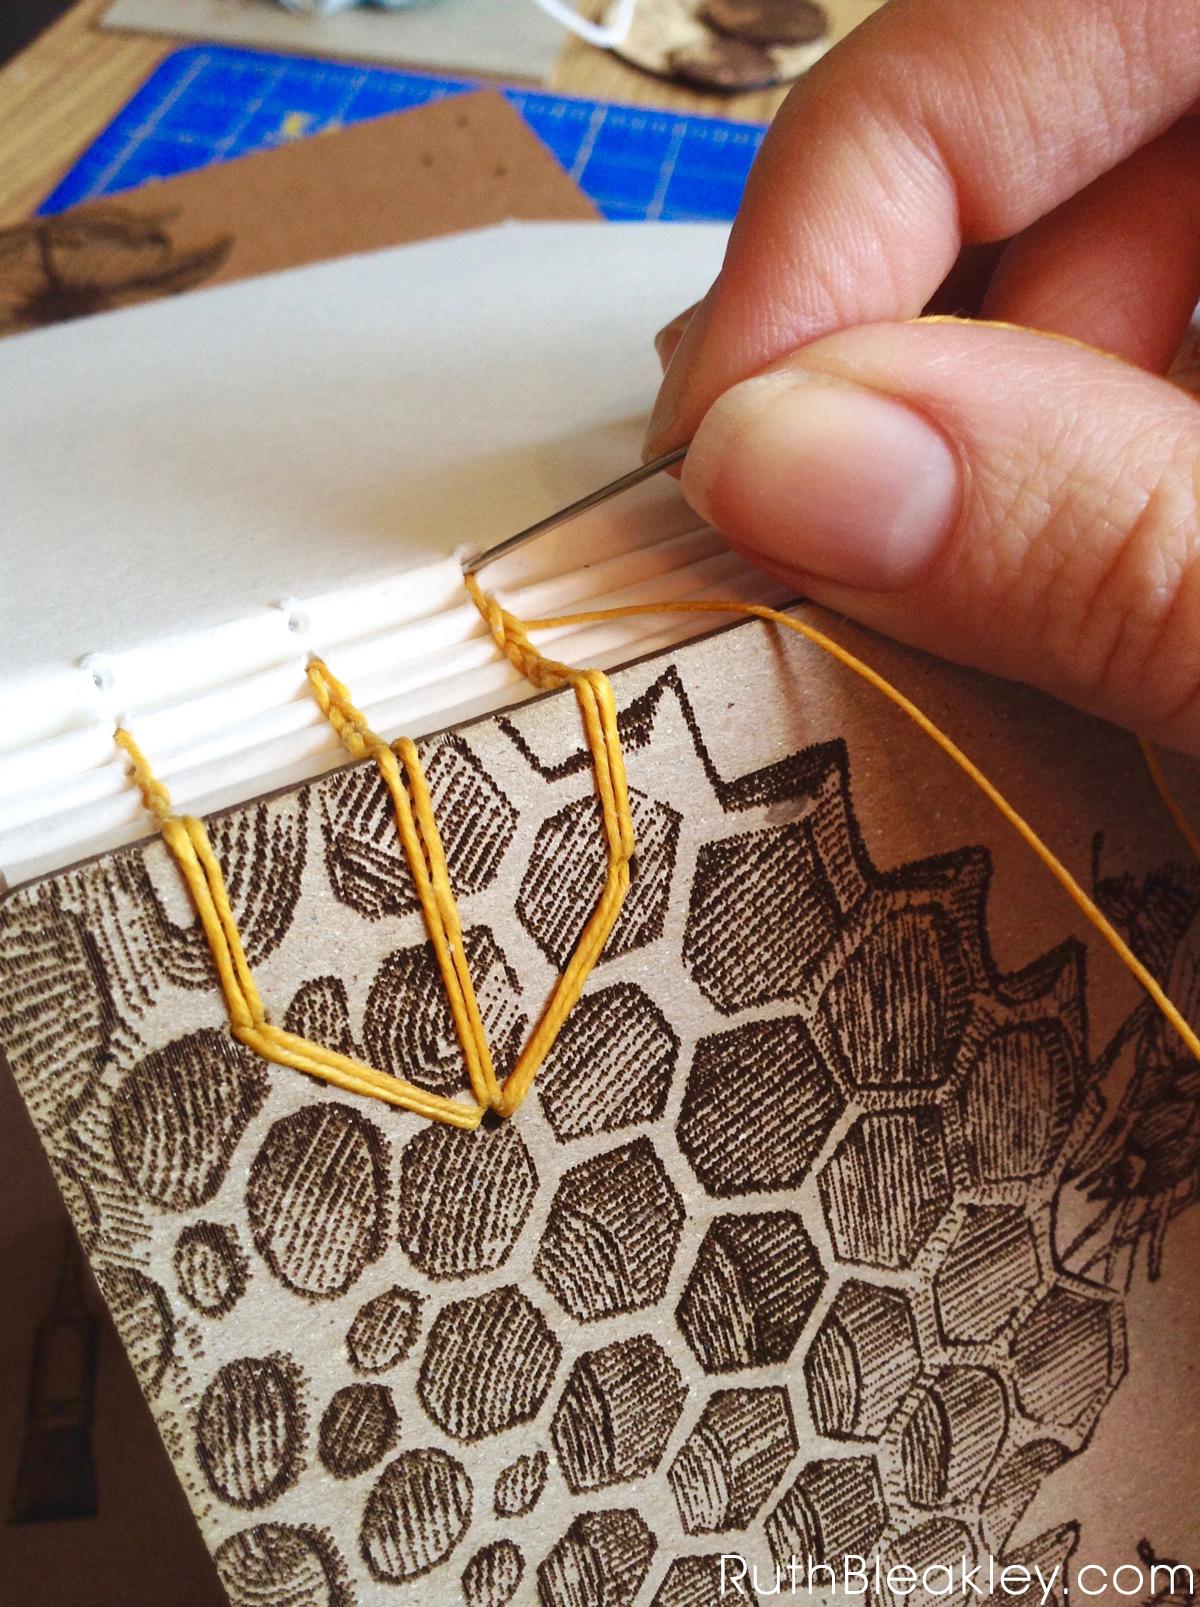 Ruth Bleakley's Studio – Handmade Books, Journals and Stationery